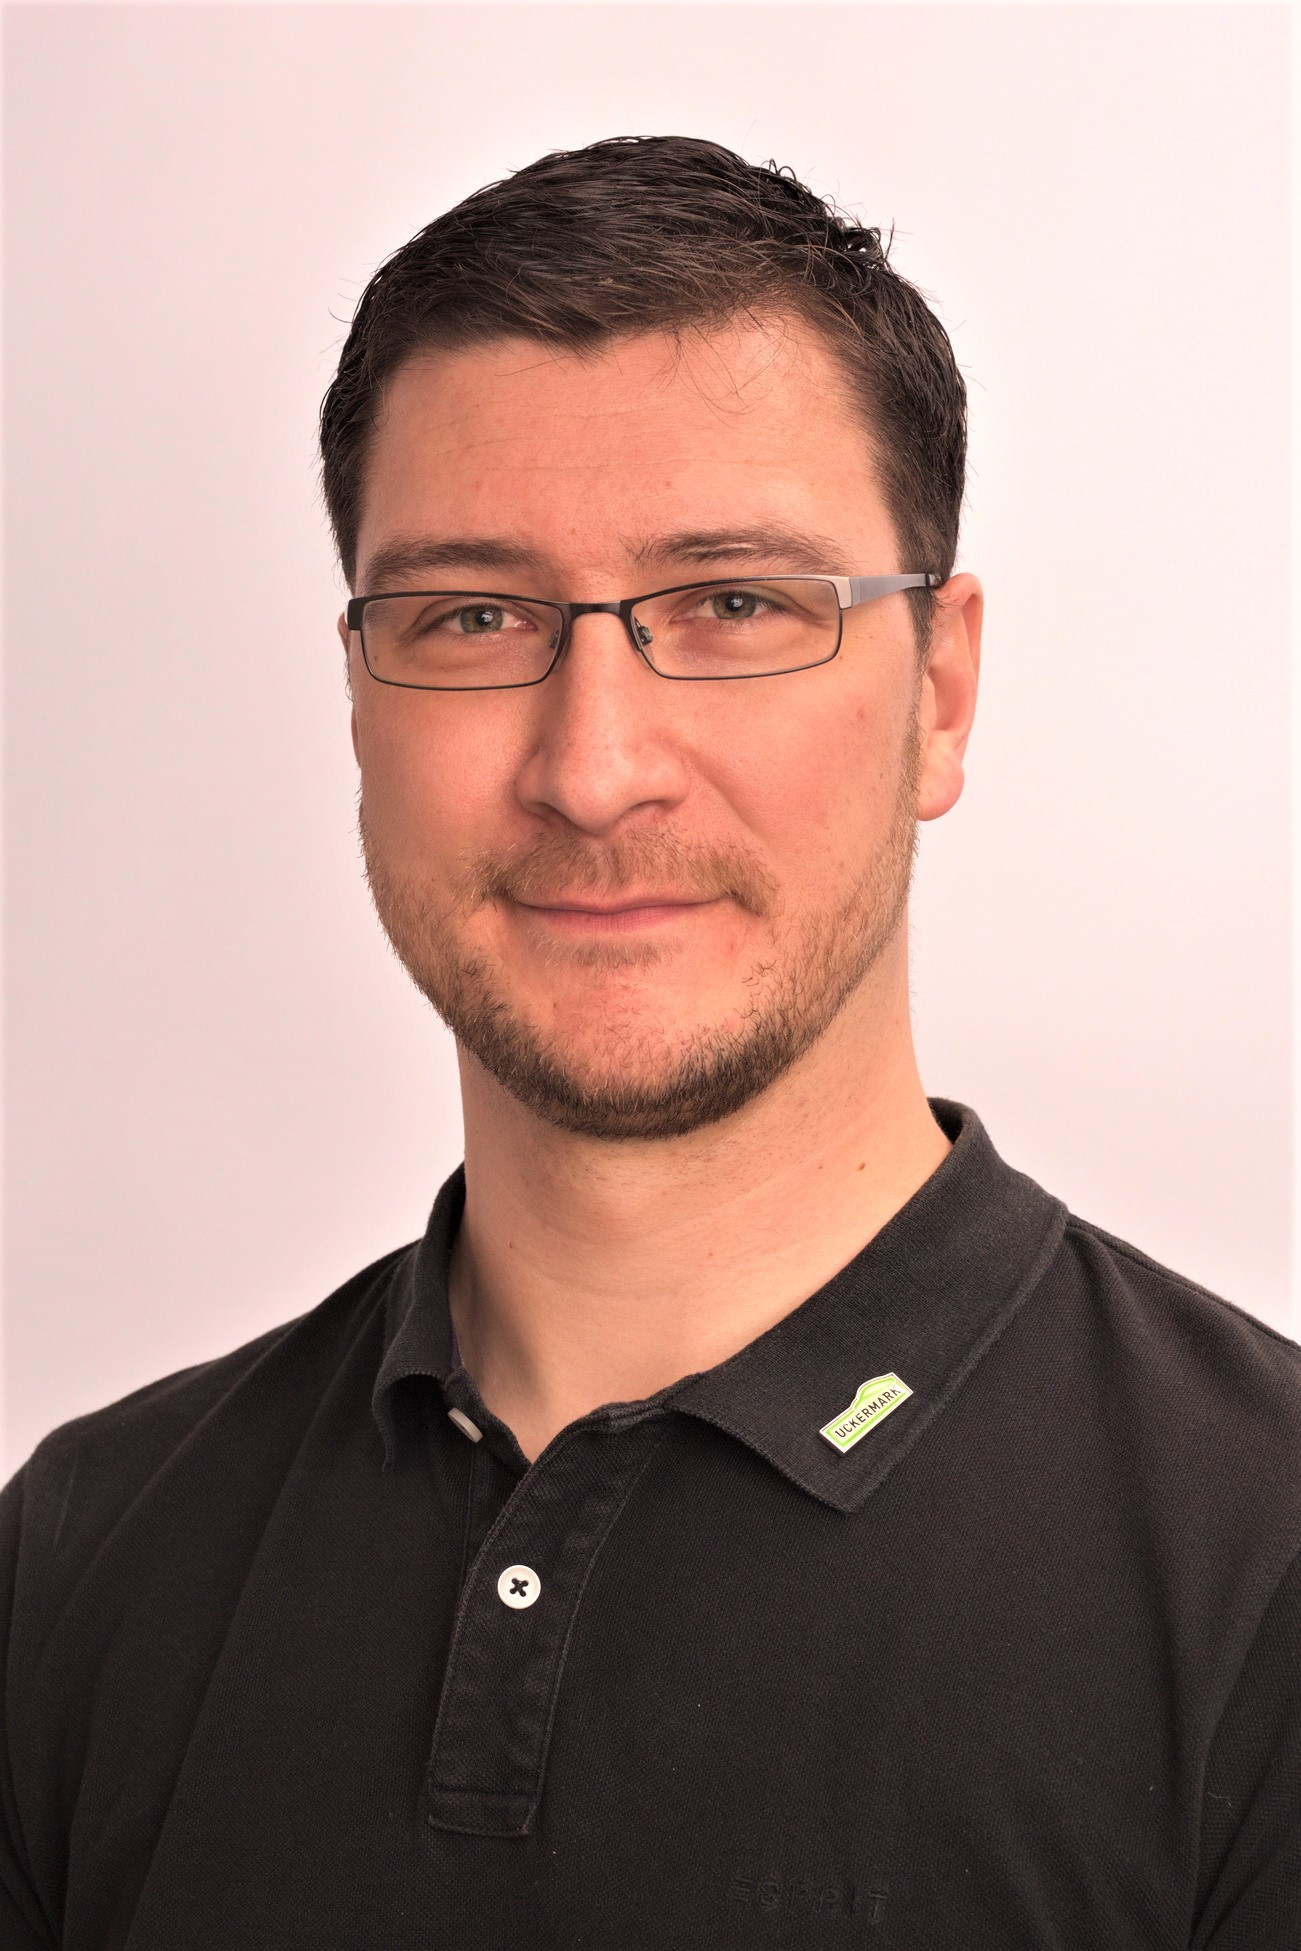 Sebastian Nimsch